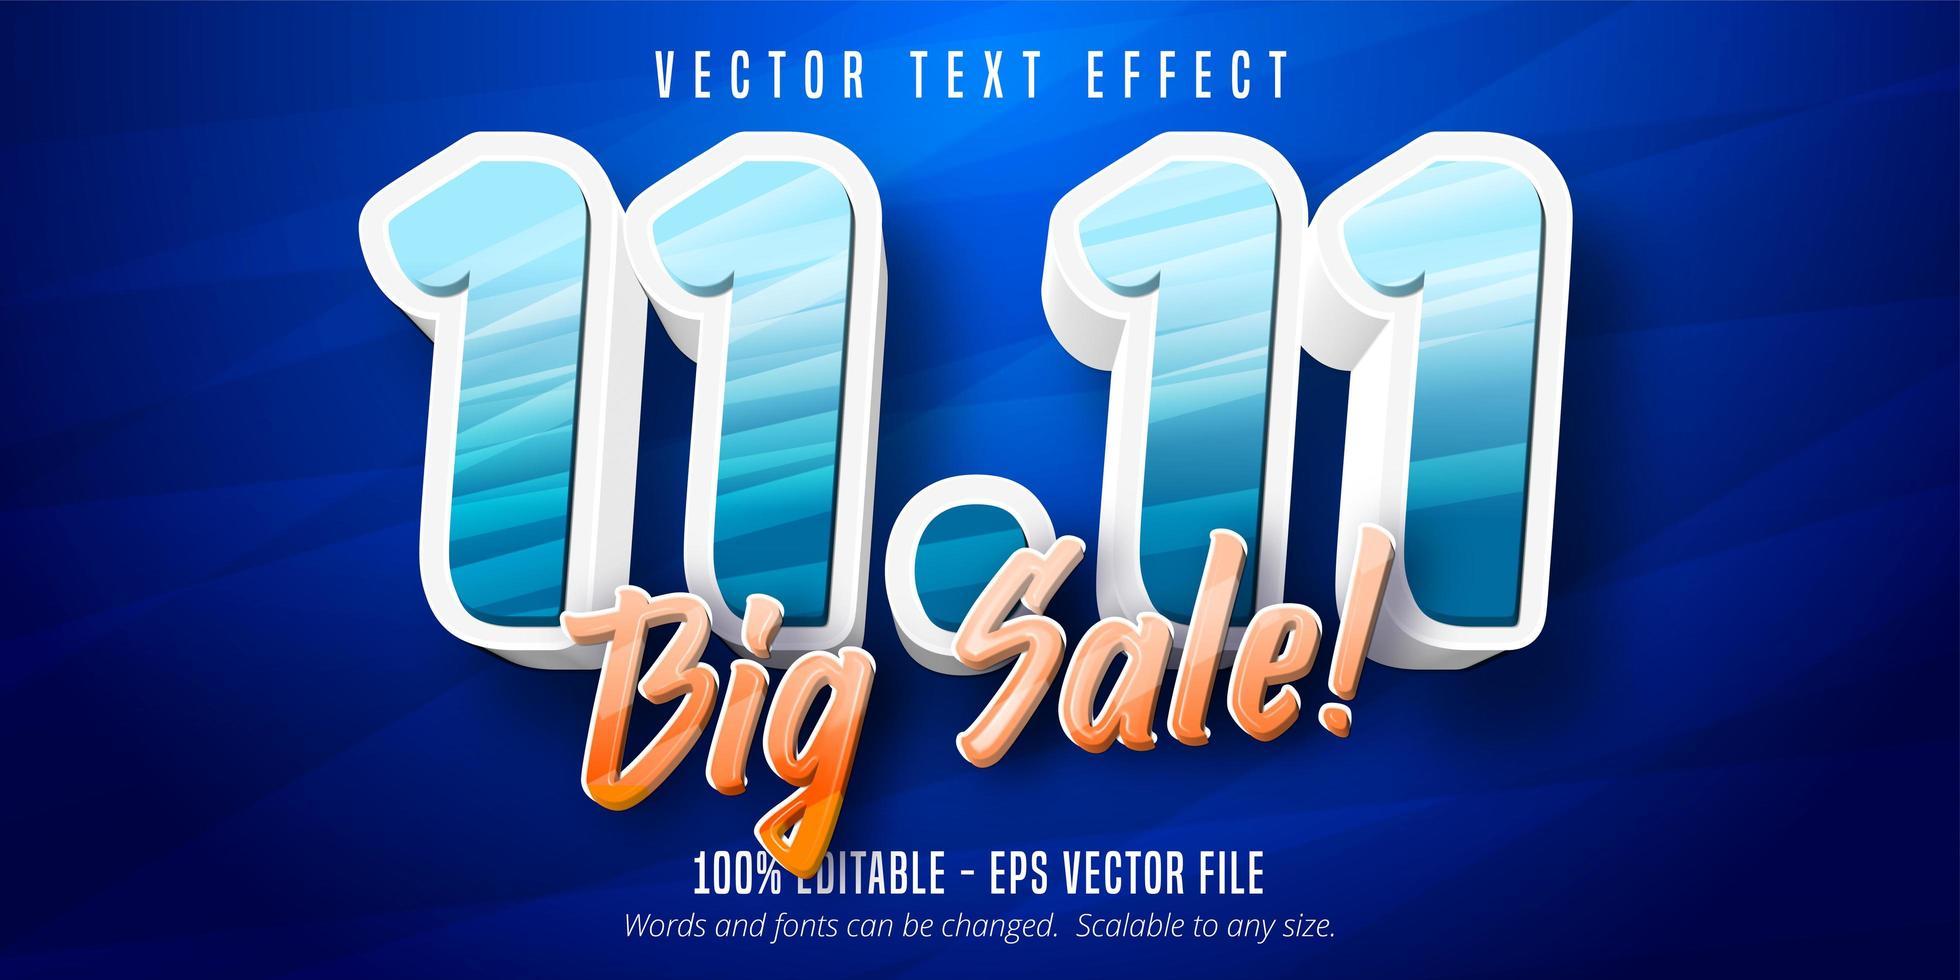 11.11 Big sale text editable text effect vector